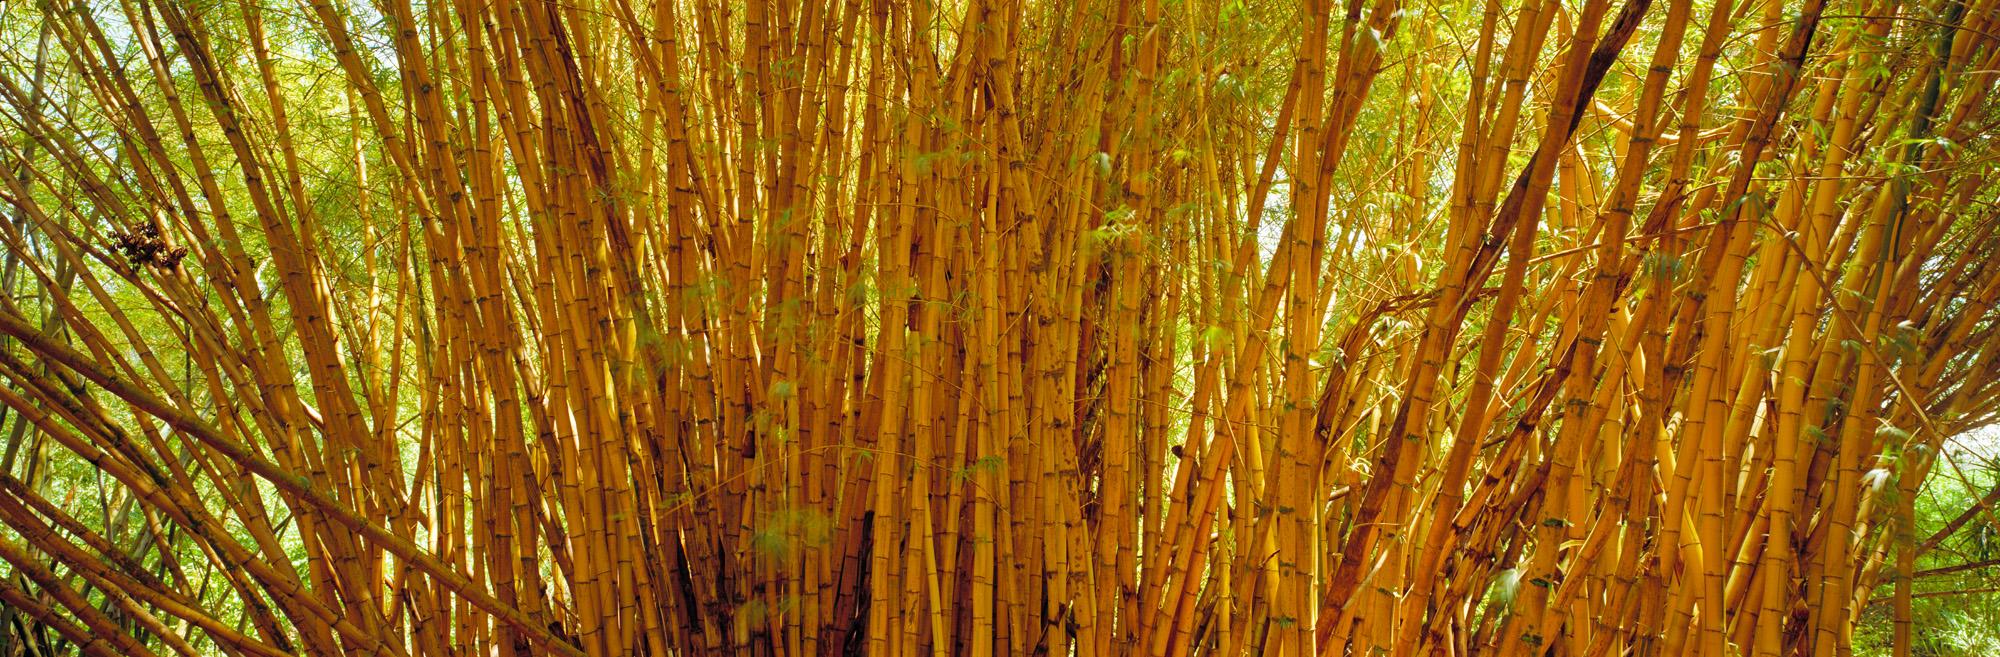 Bamboo Markus Bollenmarkus Bollen Panorama Photographie Vom Feinsten